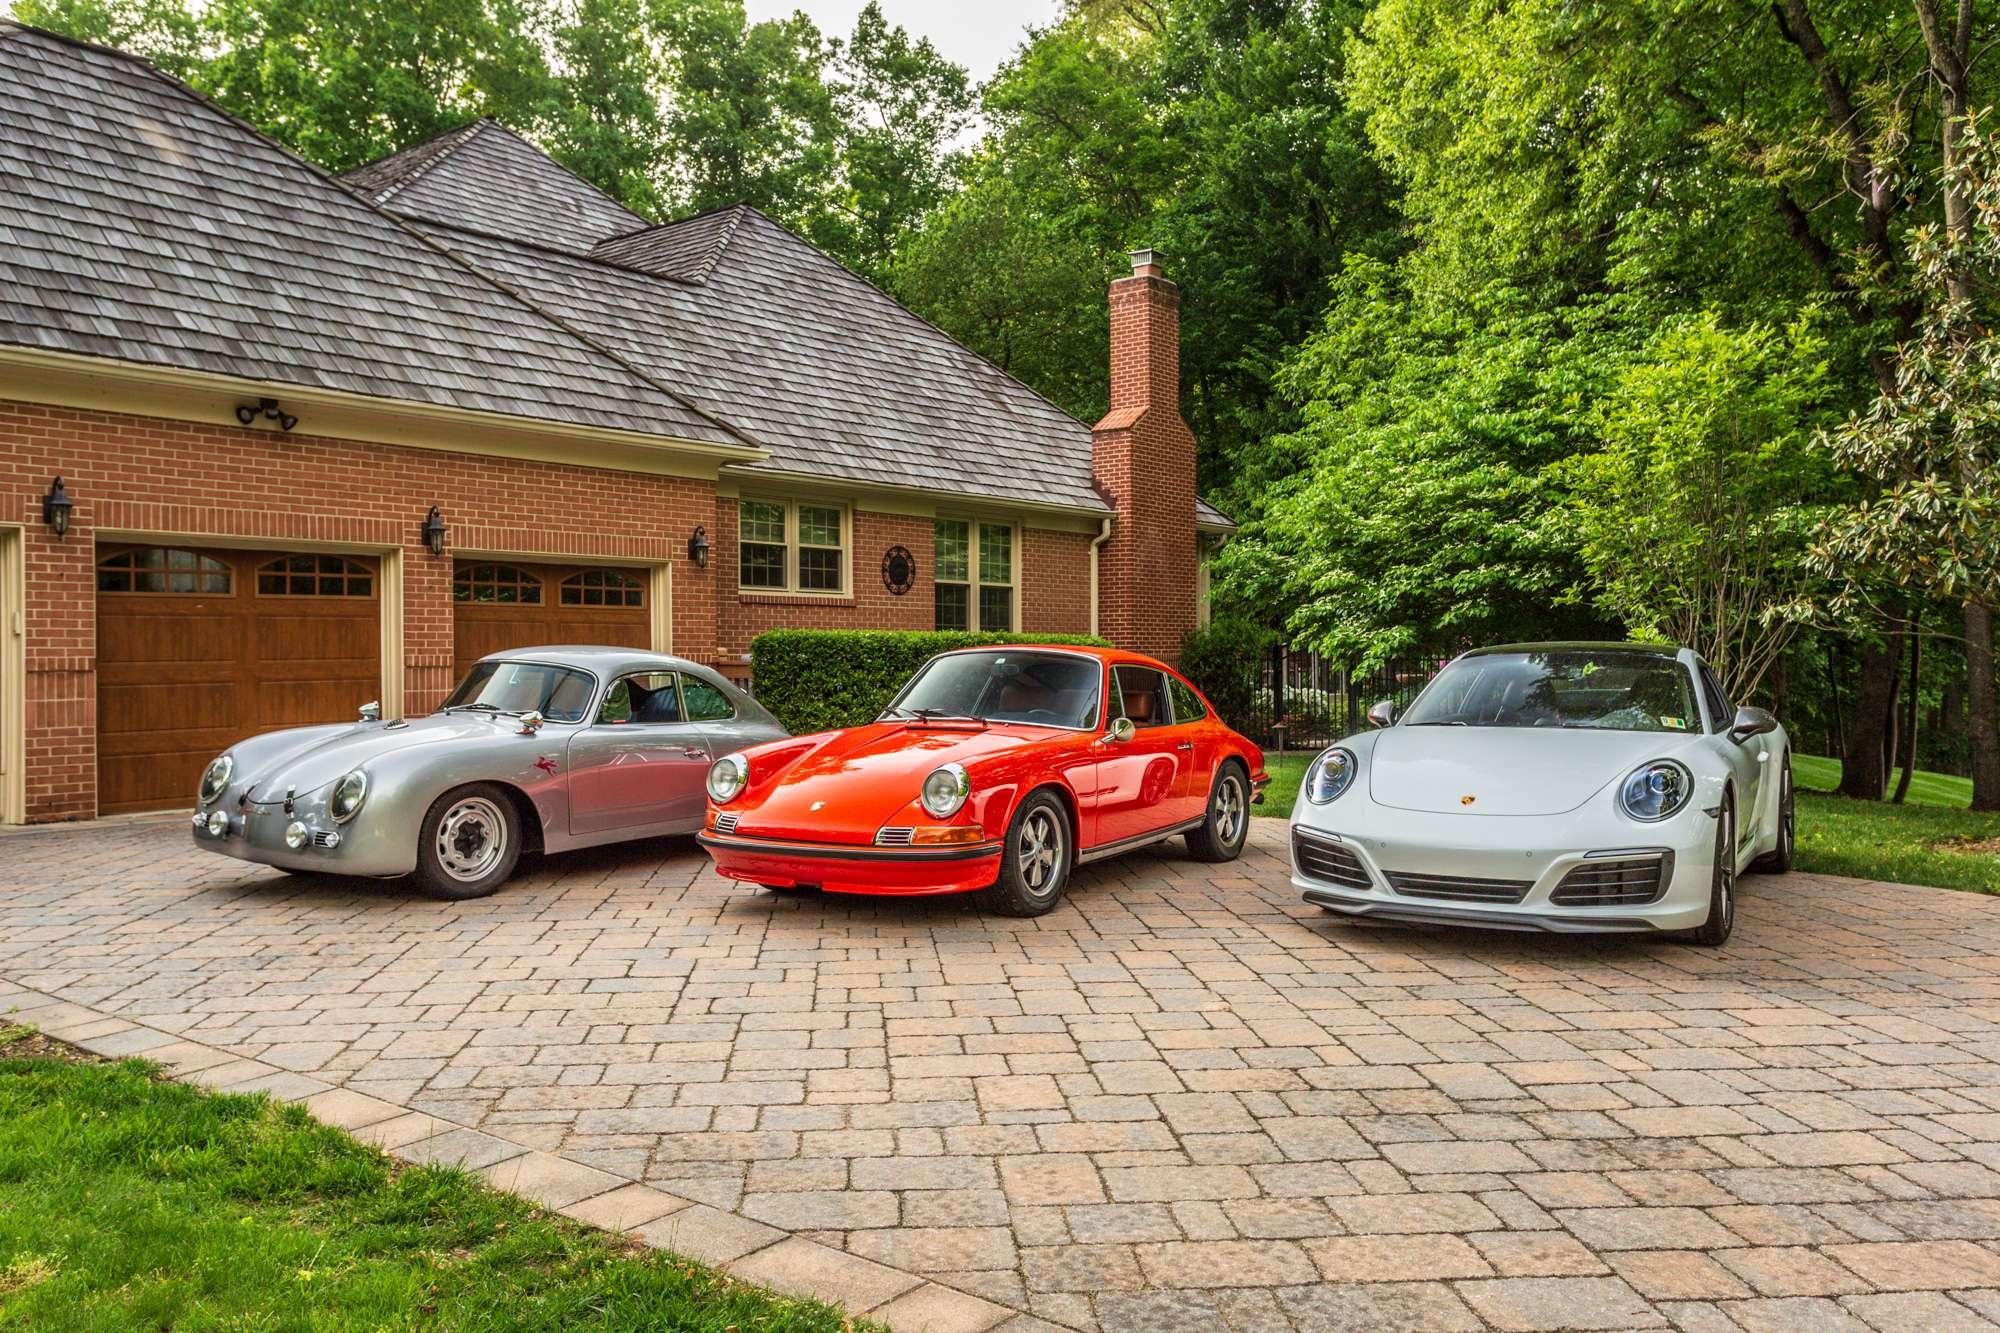 paver-driveway-cars-4